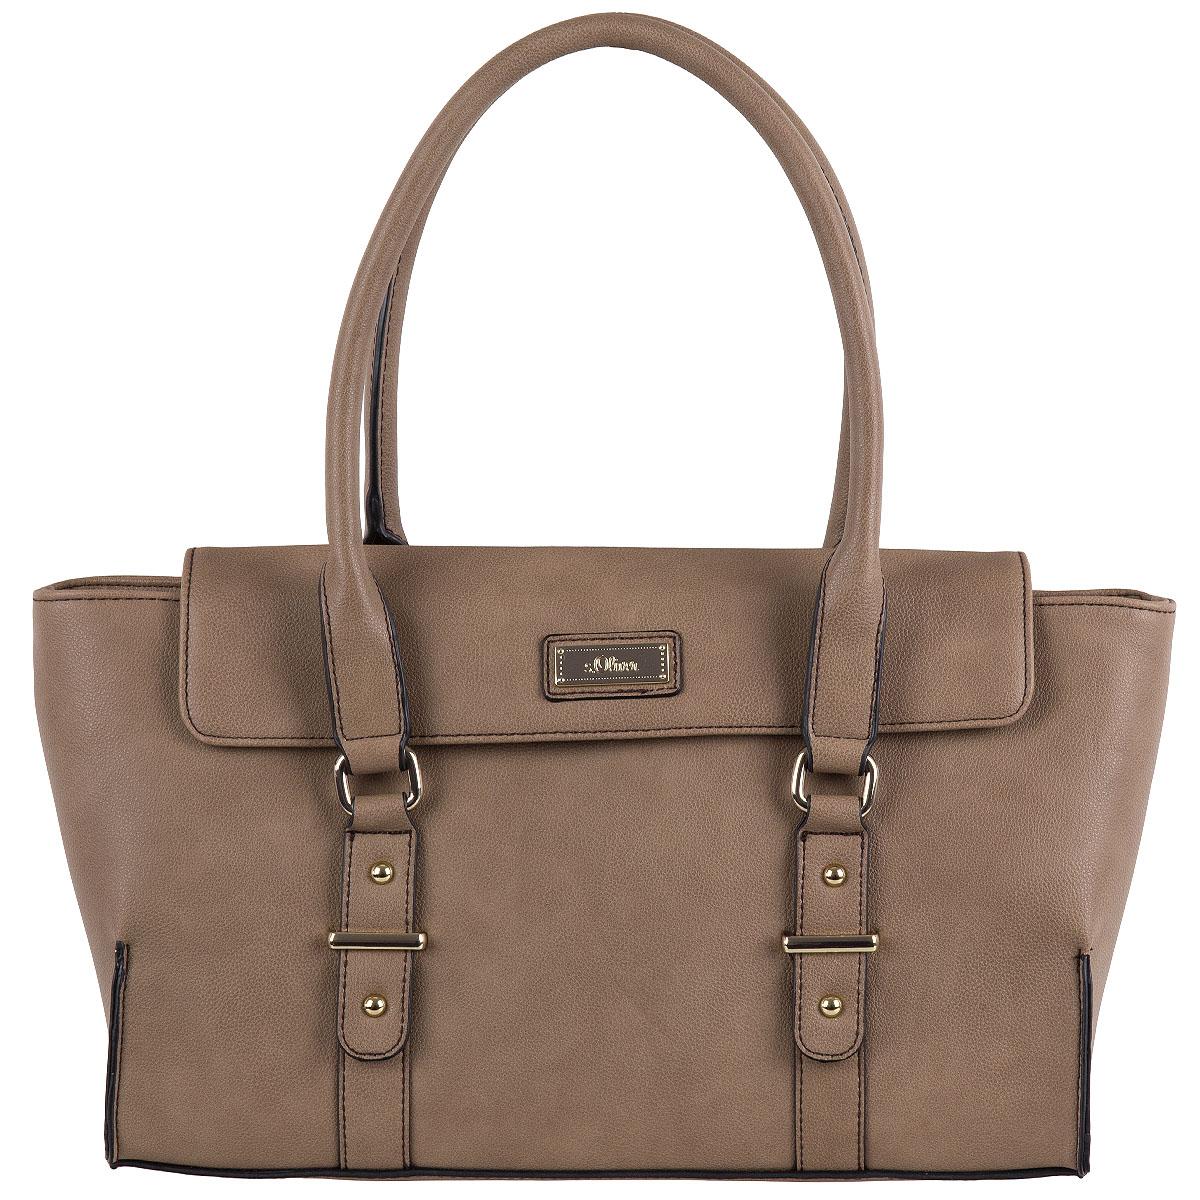 cc74196490f0e s.Oliver Shopper Handtasche Tasche Baguette Handbag 39.607.94.7779 ...